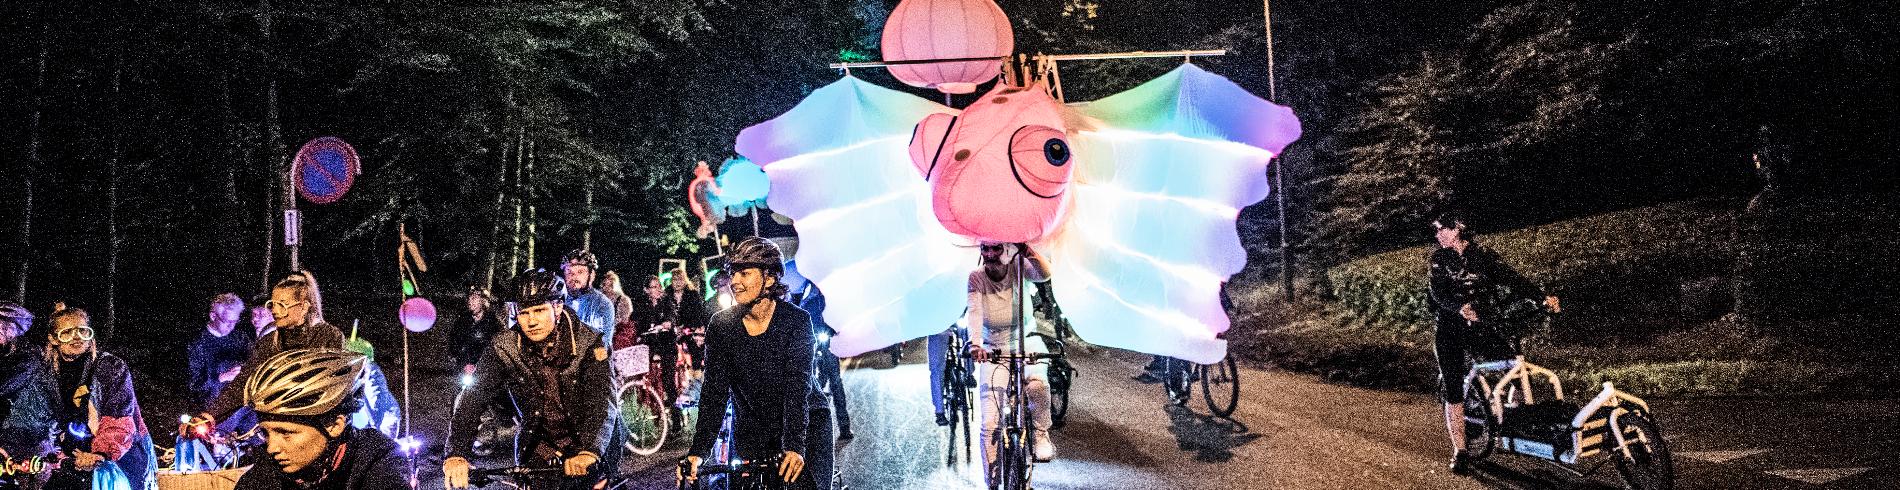 Aarhus Cykelfestival cover image